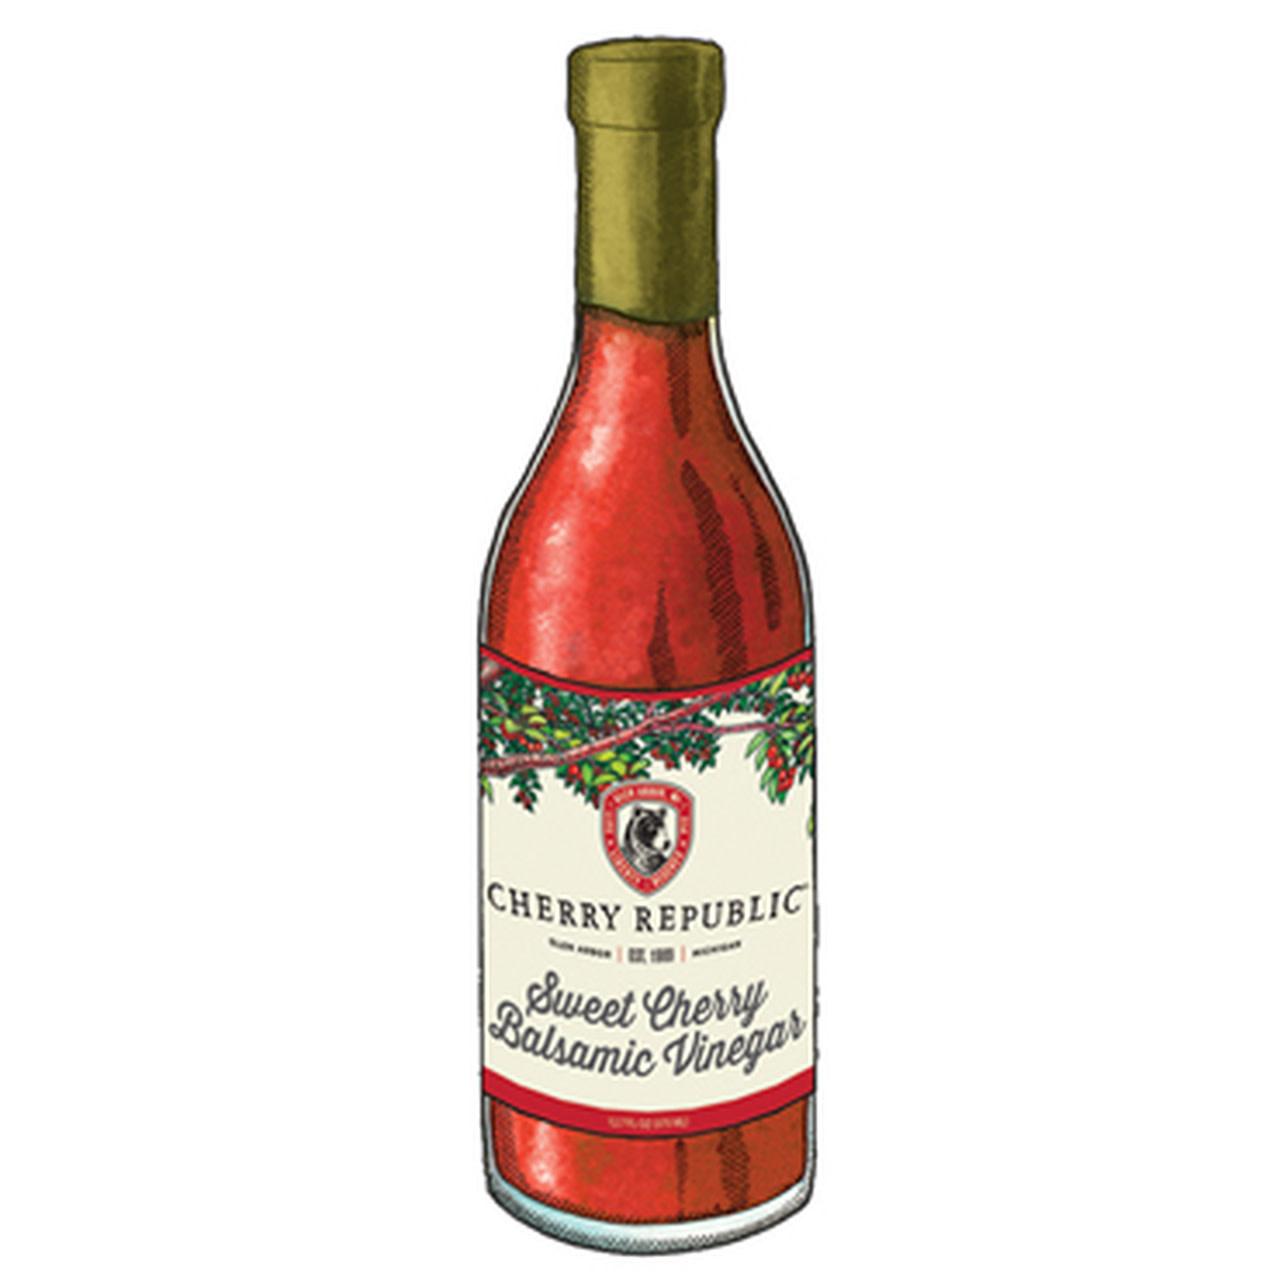 Cherry Republic Sweet Cherry Balsamic Vinegar